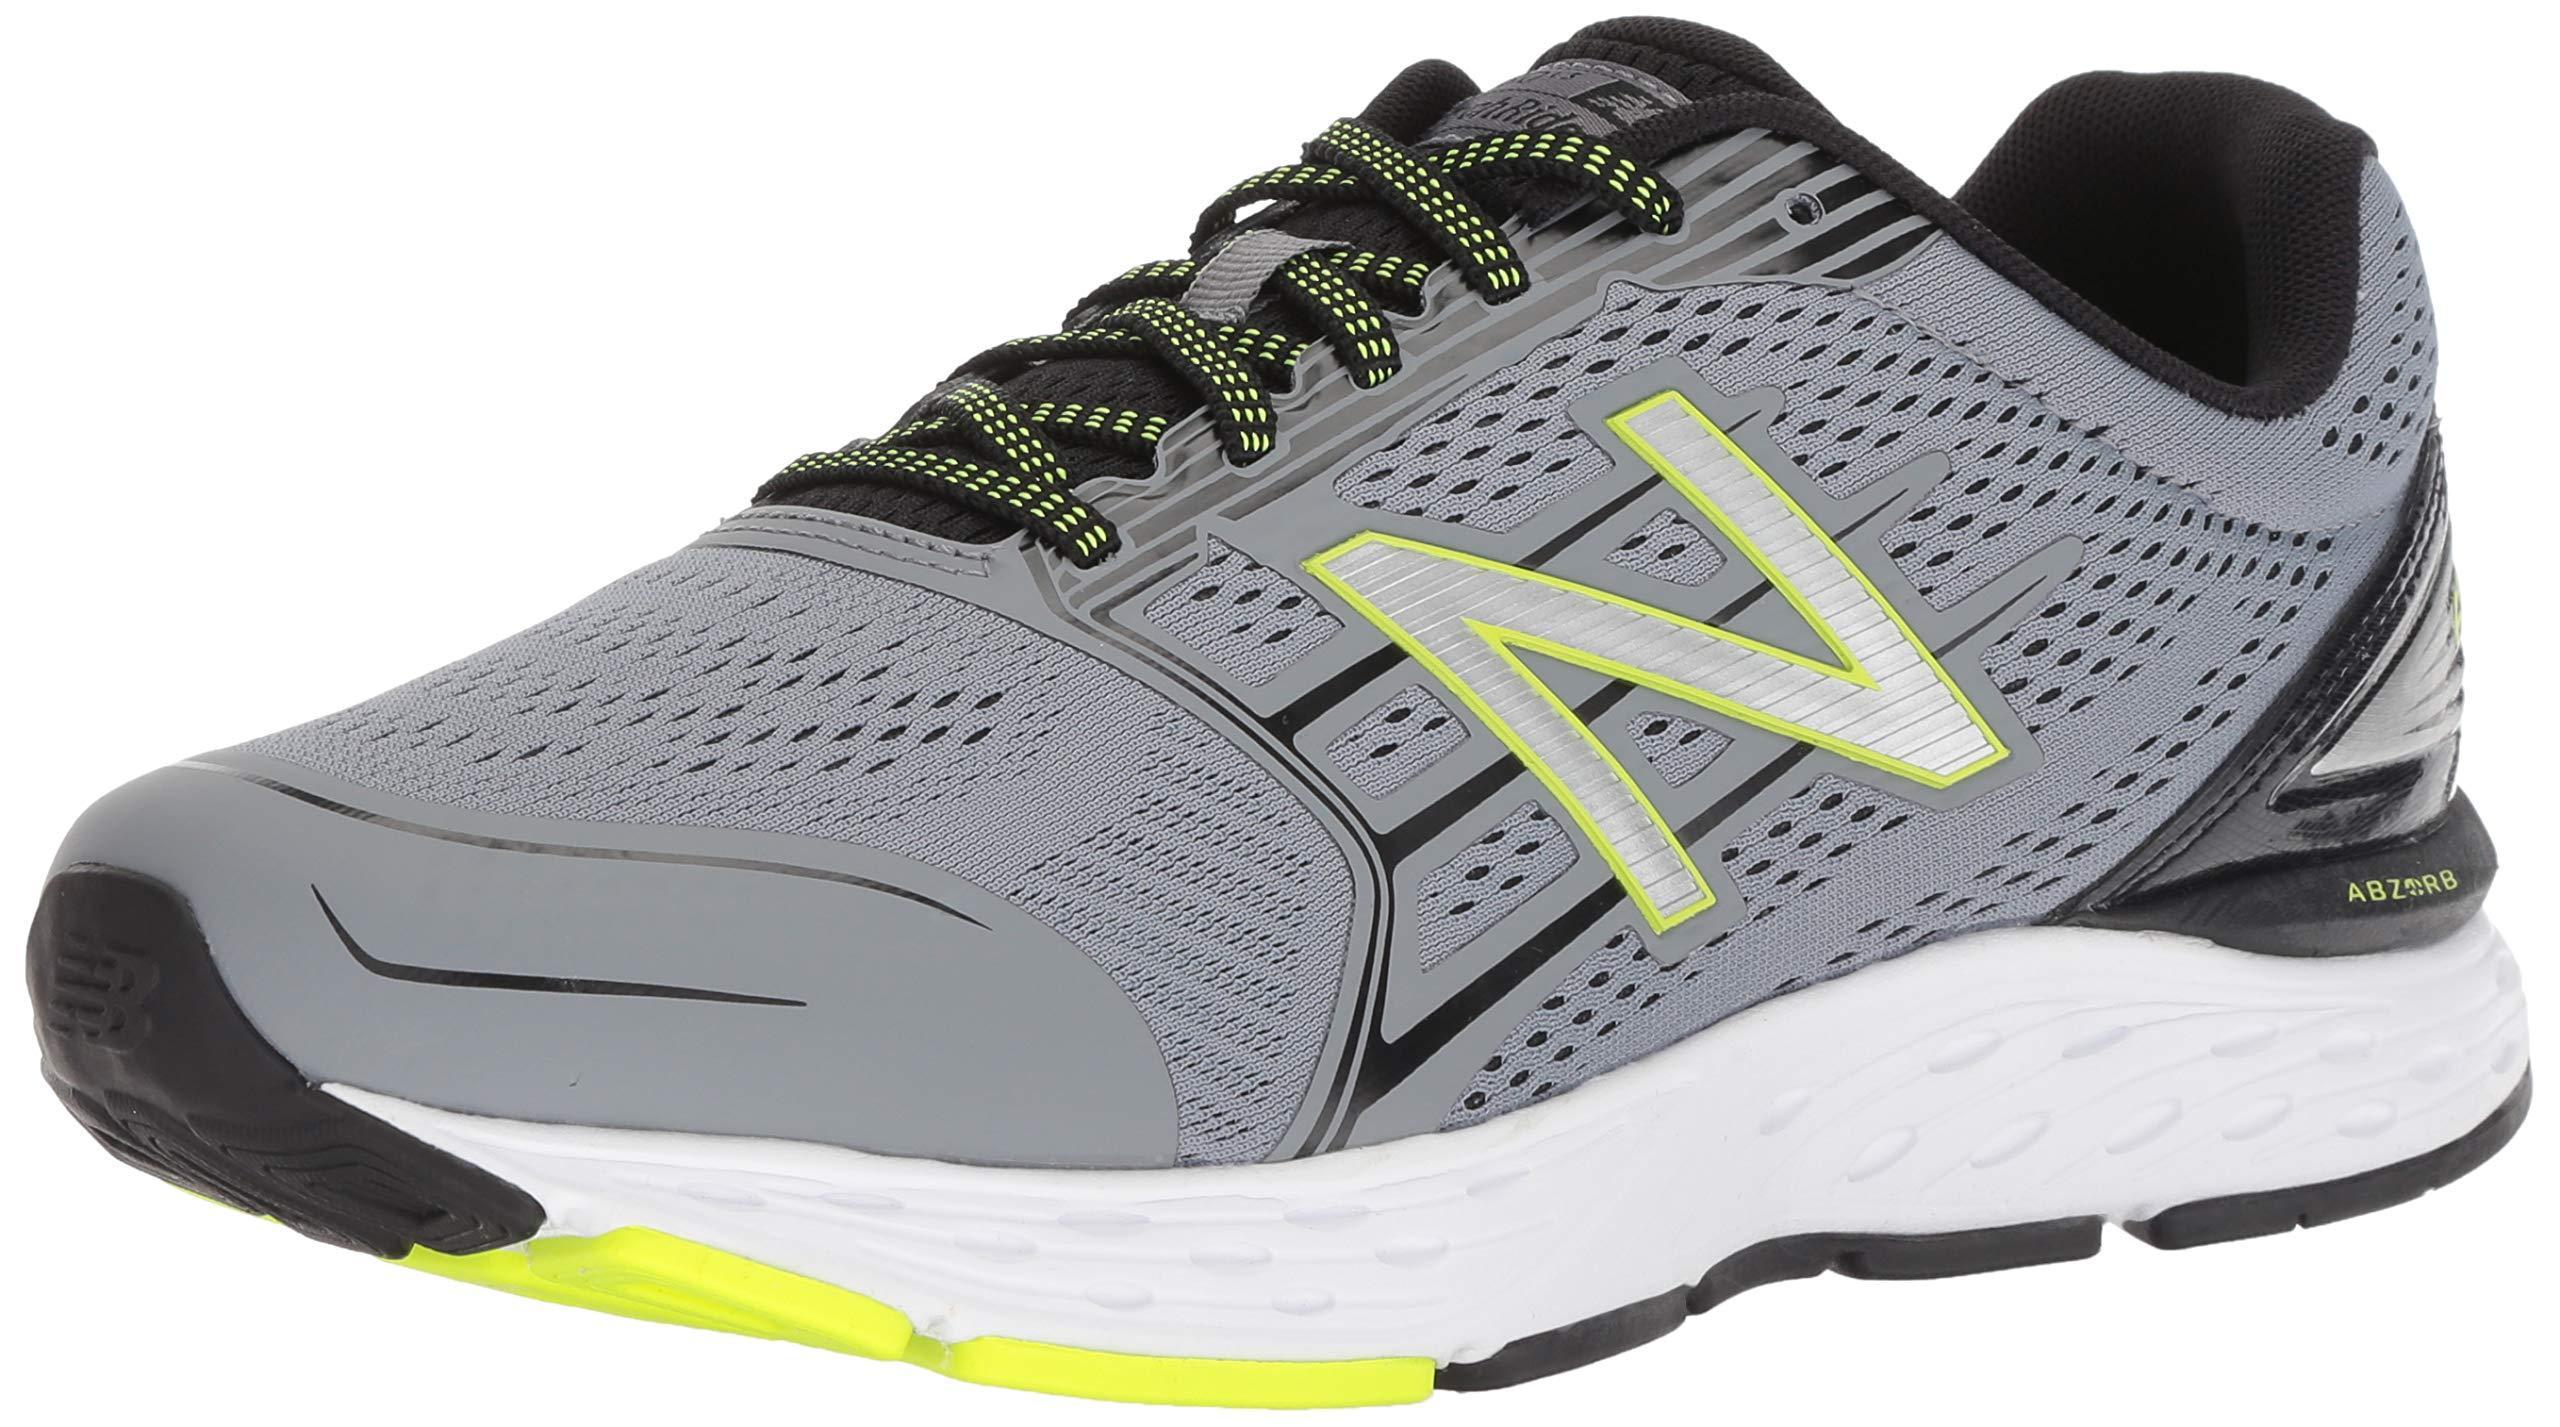 New Balance 680v5 Cushioning Running Shoe for Men - Lyst